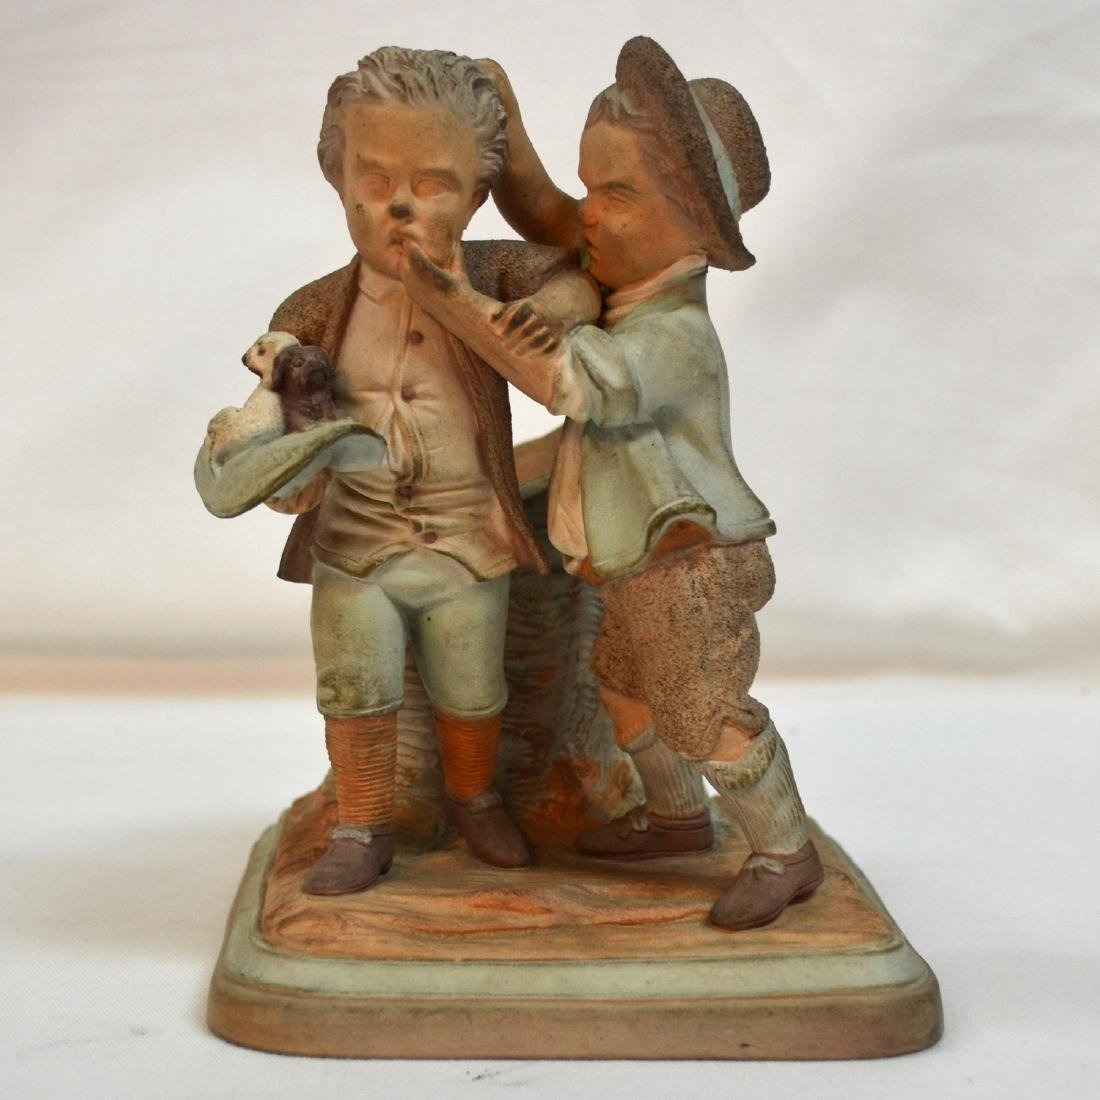 19thc English Terracotta Smoking Stand Two Boys w